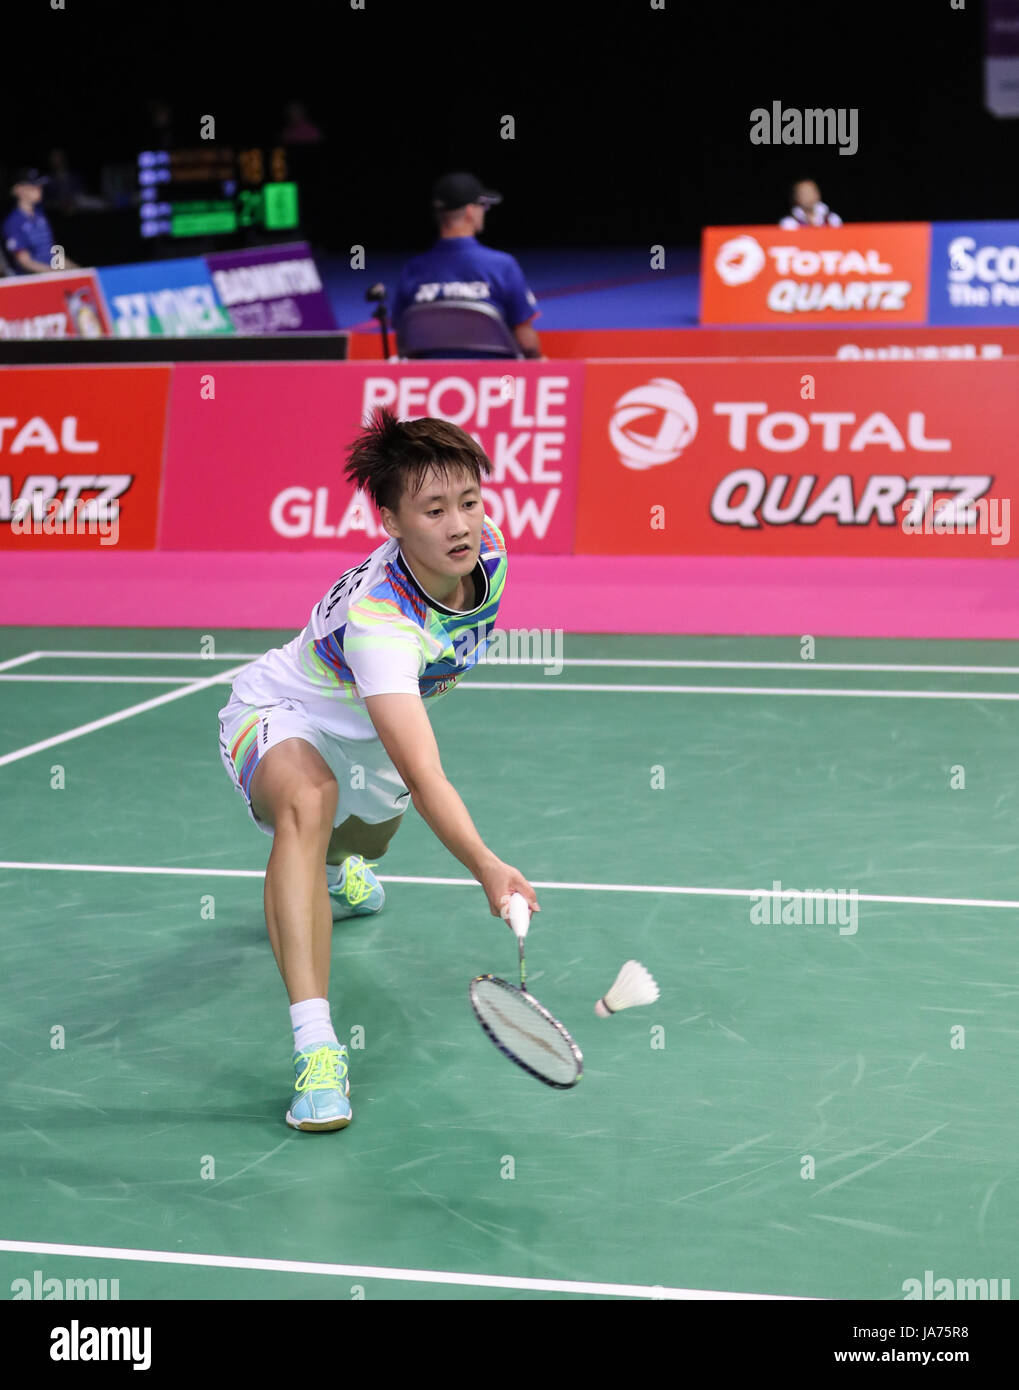 GLASGOW Aug 25 2017 Xinhua Chen Yufei of China